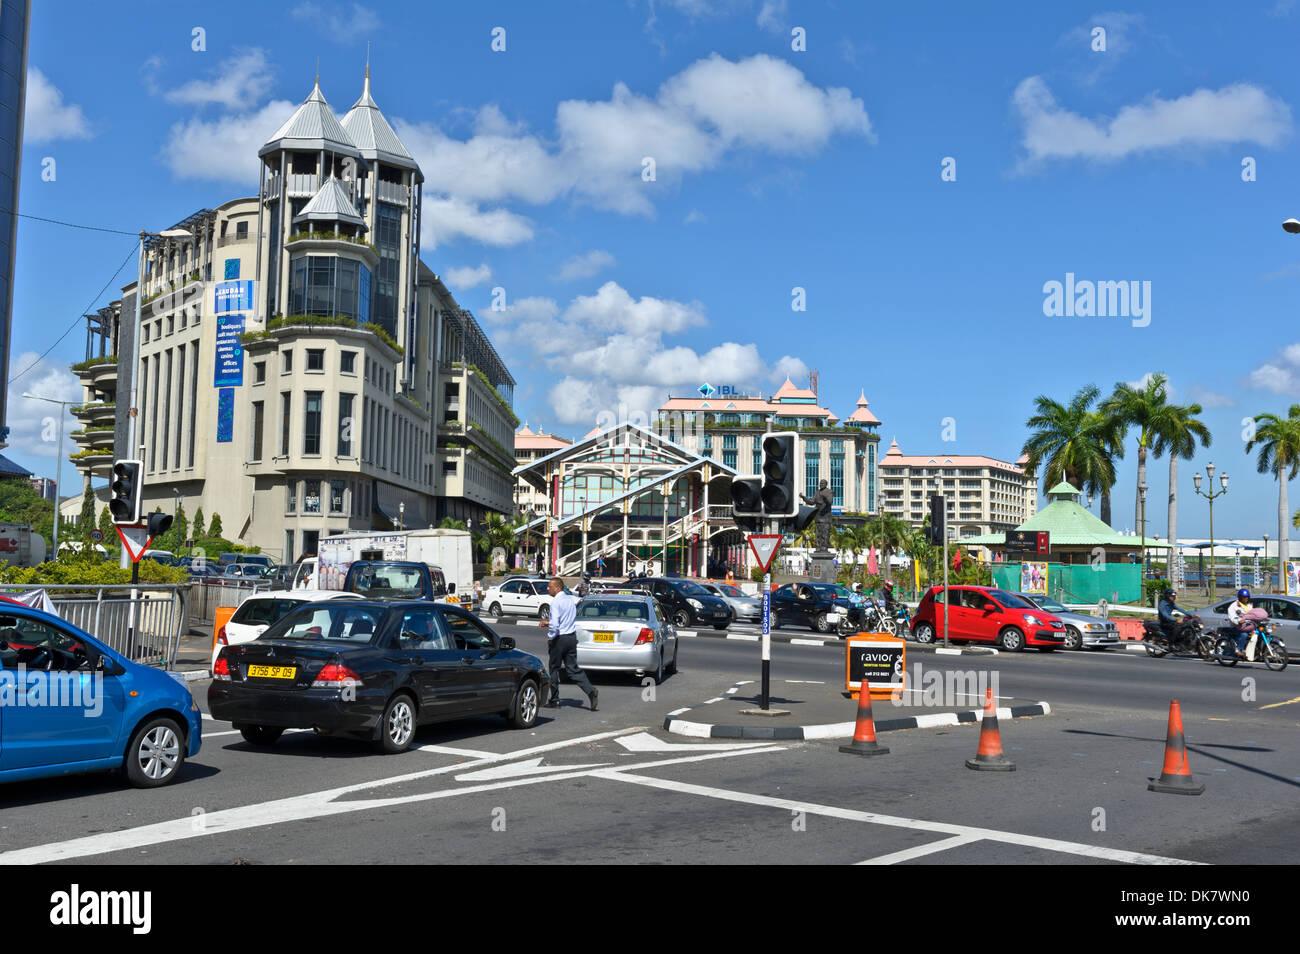 Traffic at Caudan Waterfront, Port Louis, Mauritius. Stock Photo